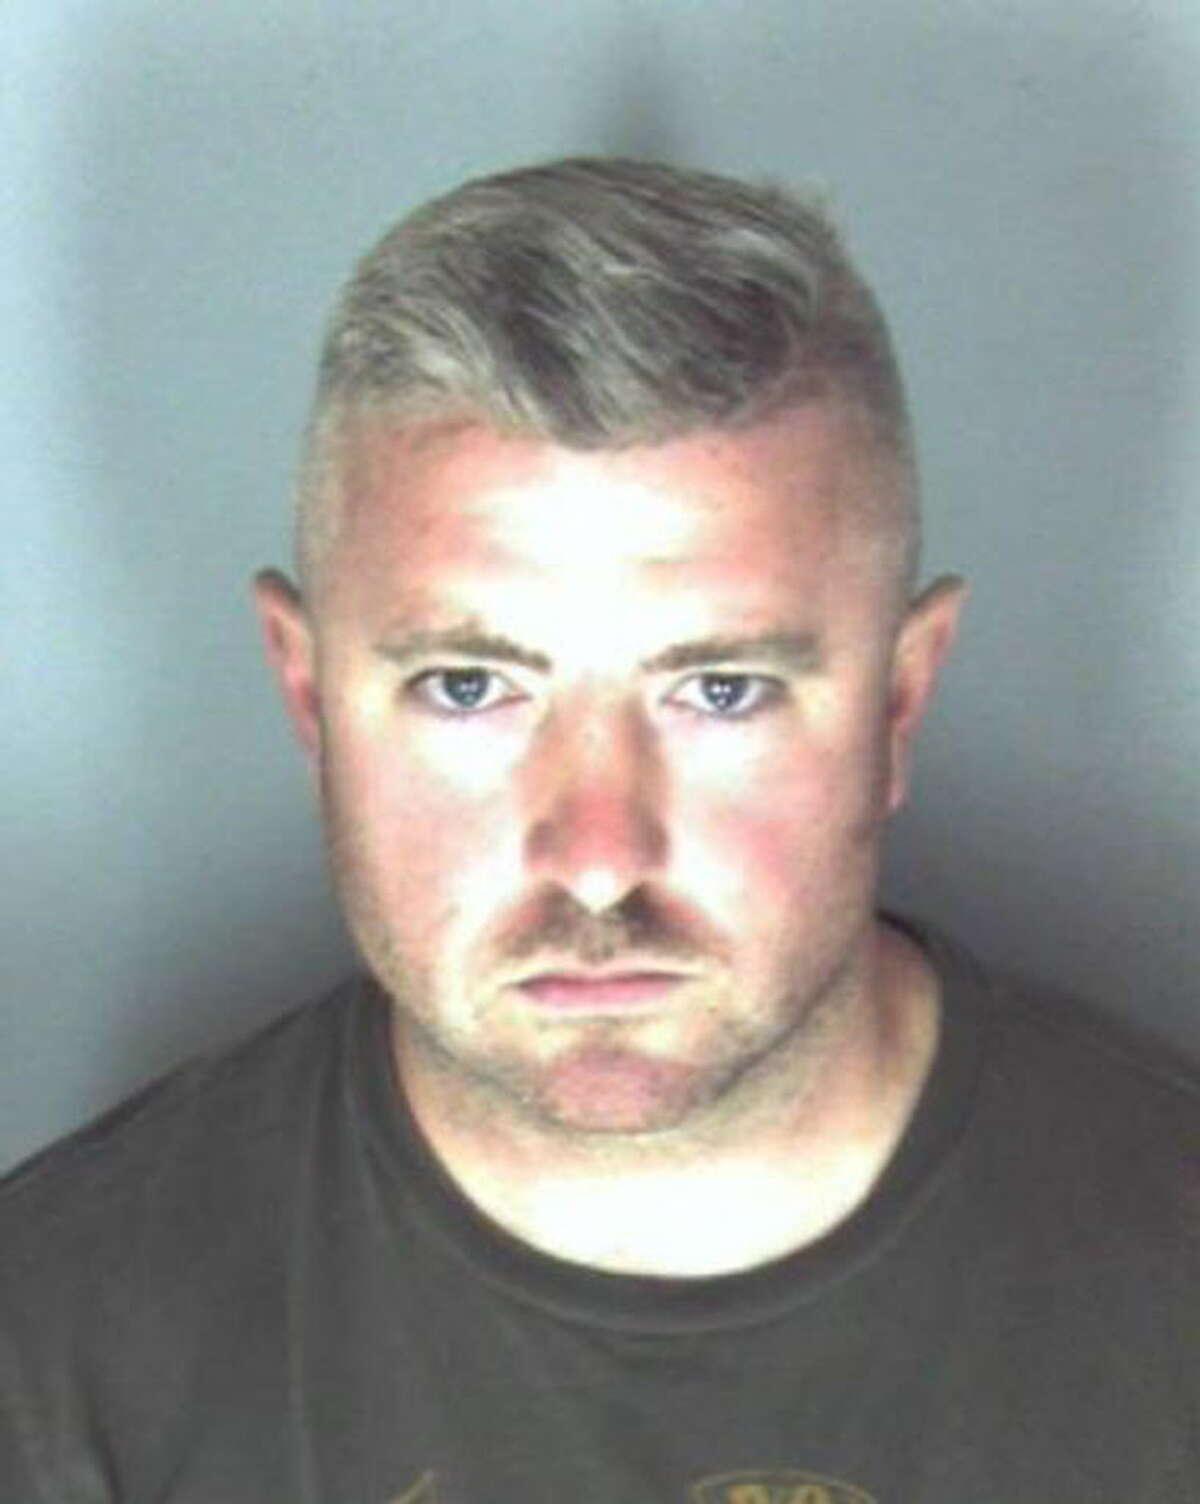 Joshua Spratt, 34, (Albany County Sheriff's Department)